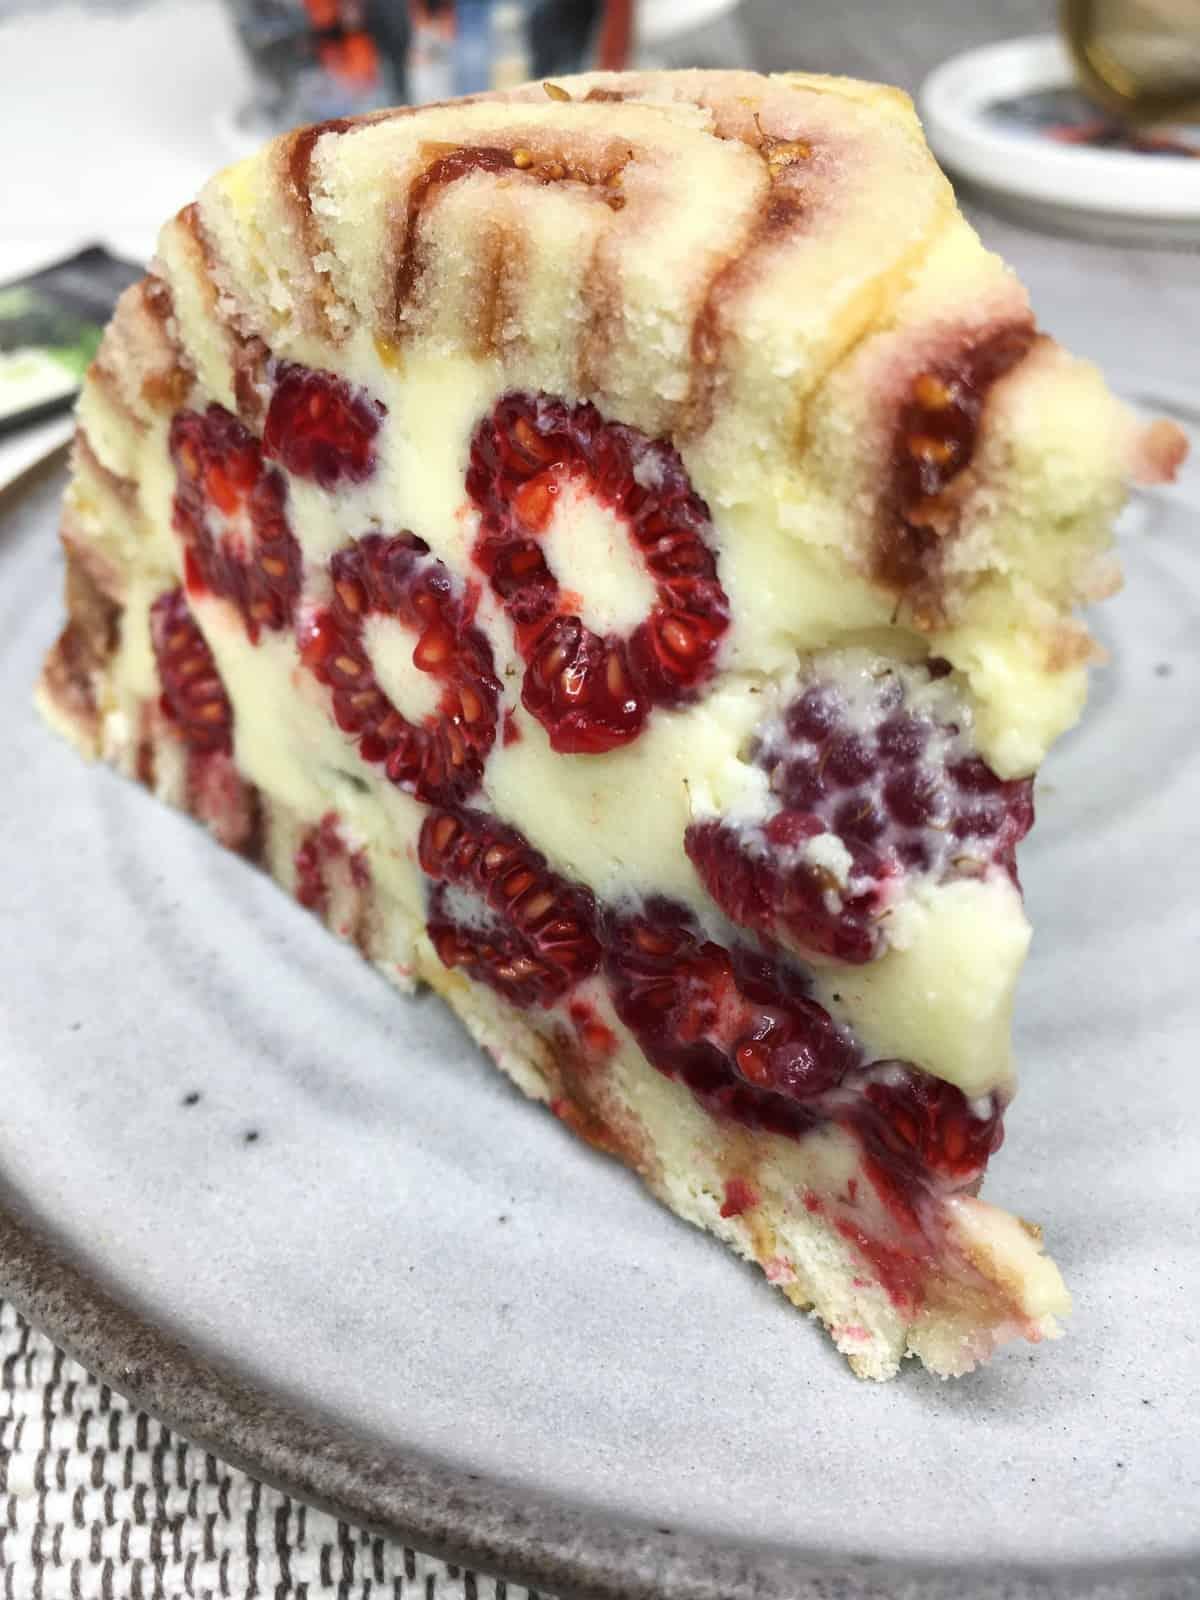 Raspberry Charlotte Royale Cake Baking Like A Chef